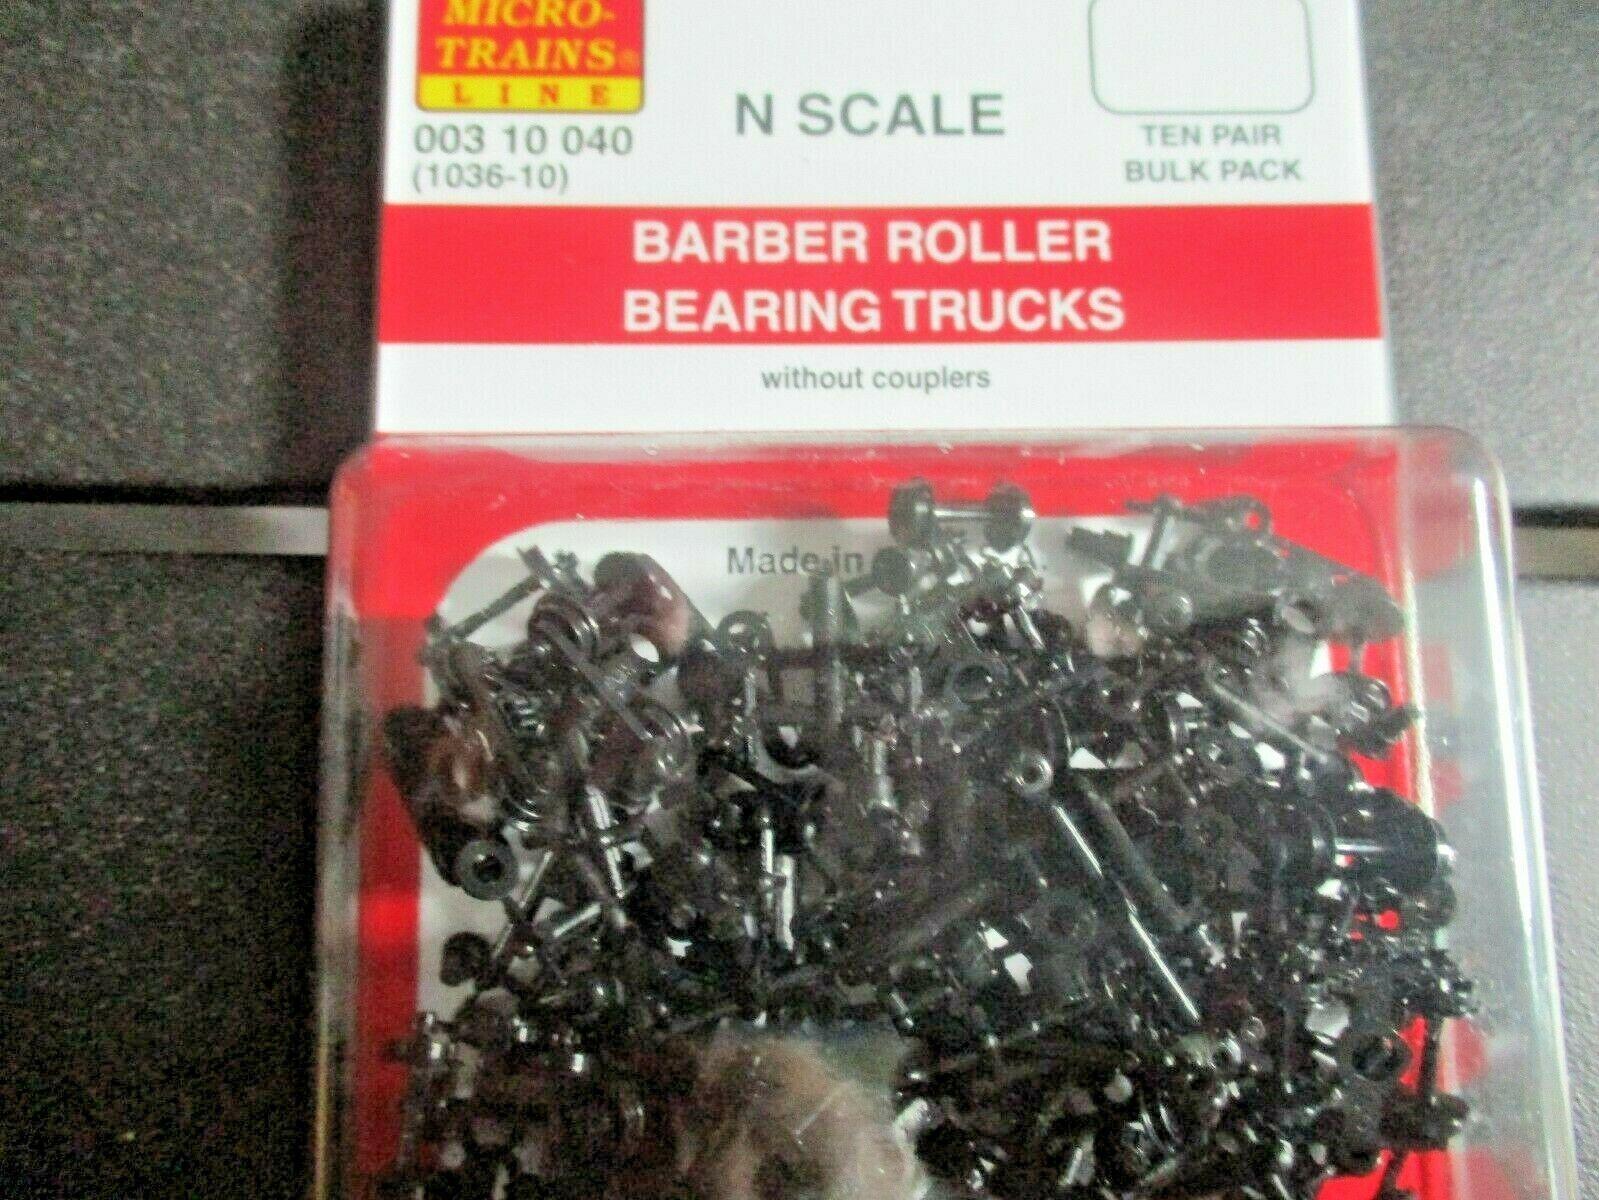 Micro-Trains Stock # 00310040 (1036-10) Barber Roller Bearing Trucks w/o Coupler